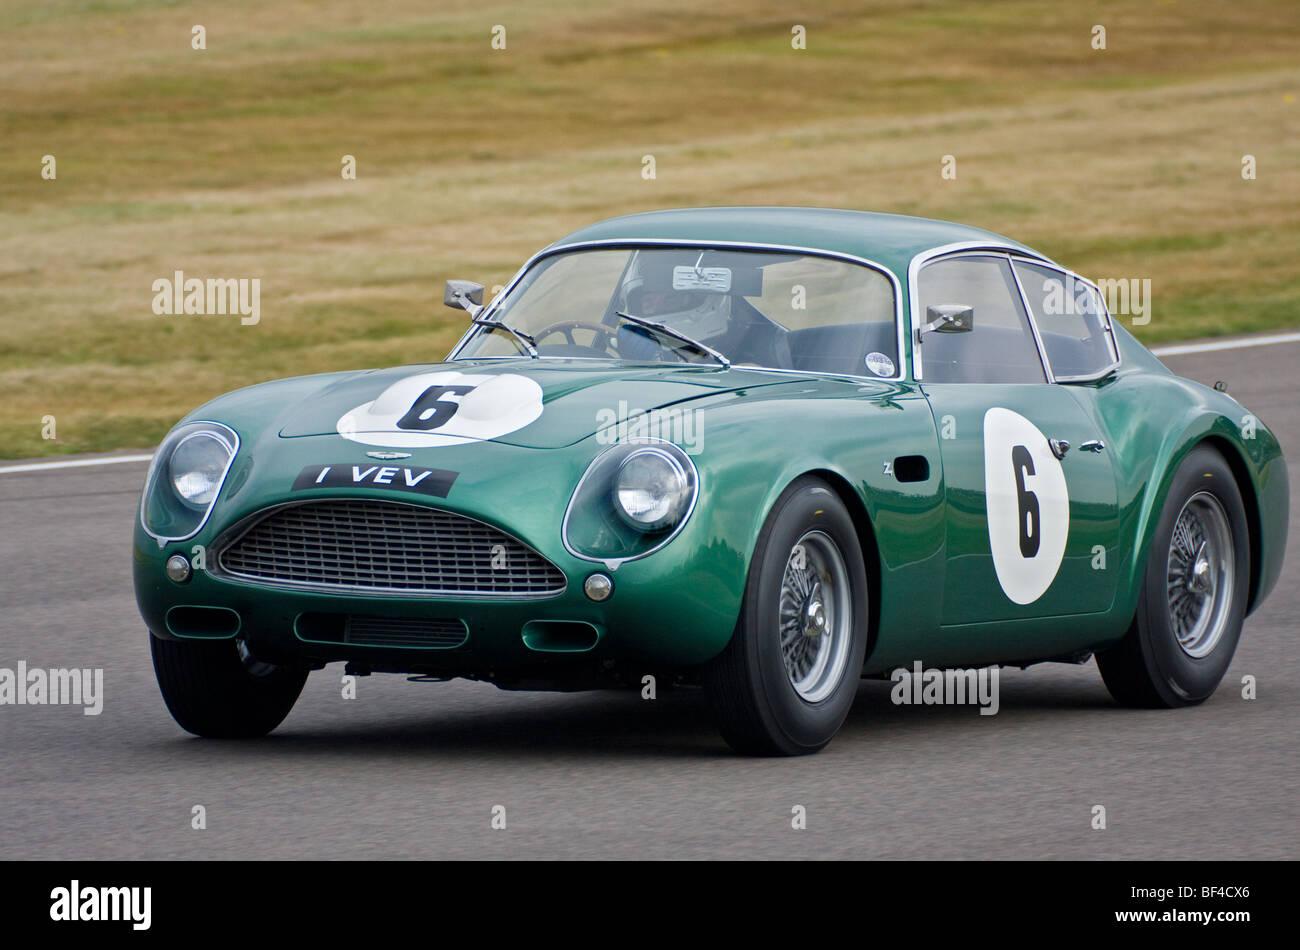 1961 Aston Martin Db4gt Zagato During The Rac Tt Race At The 2009 Stock Photo Alamy